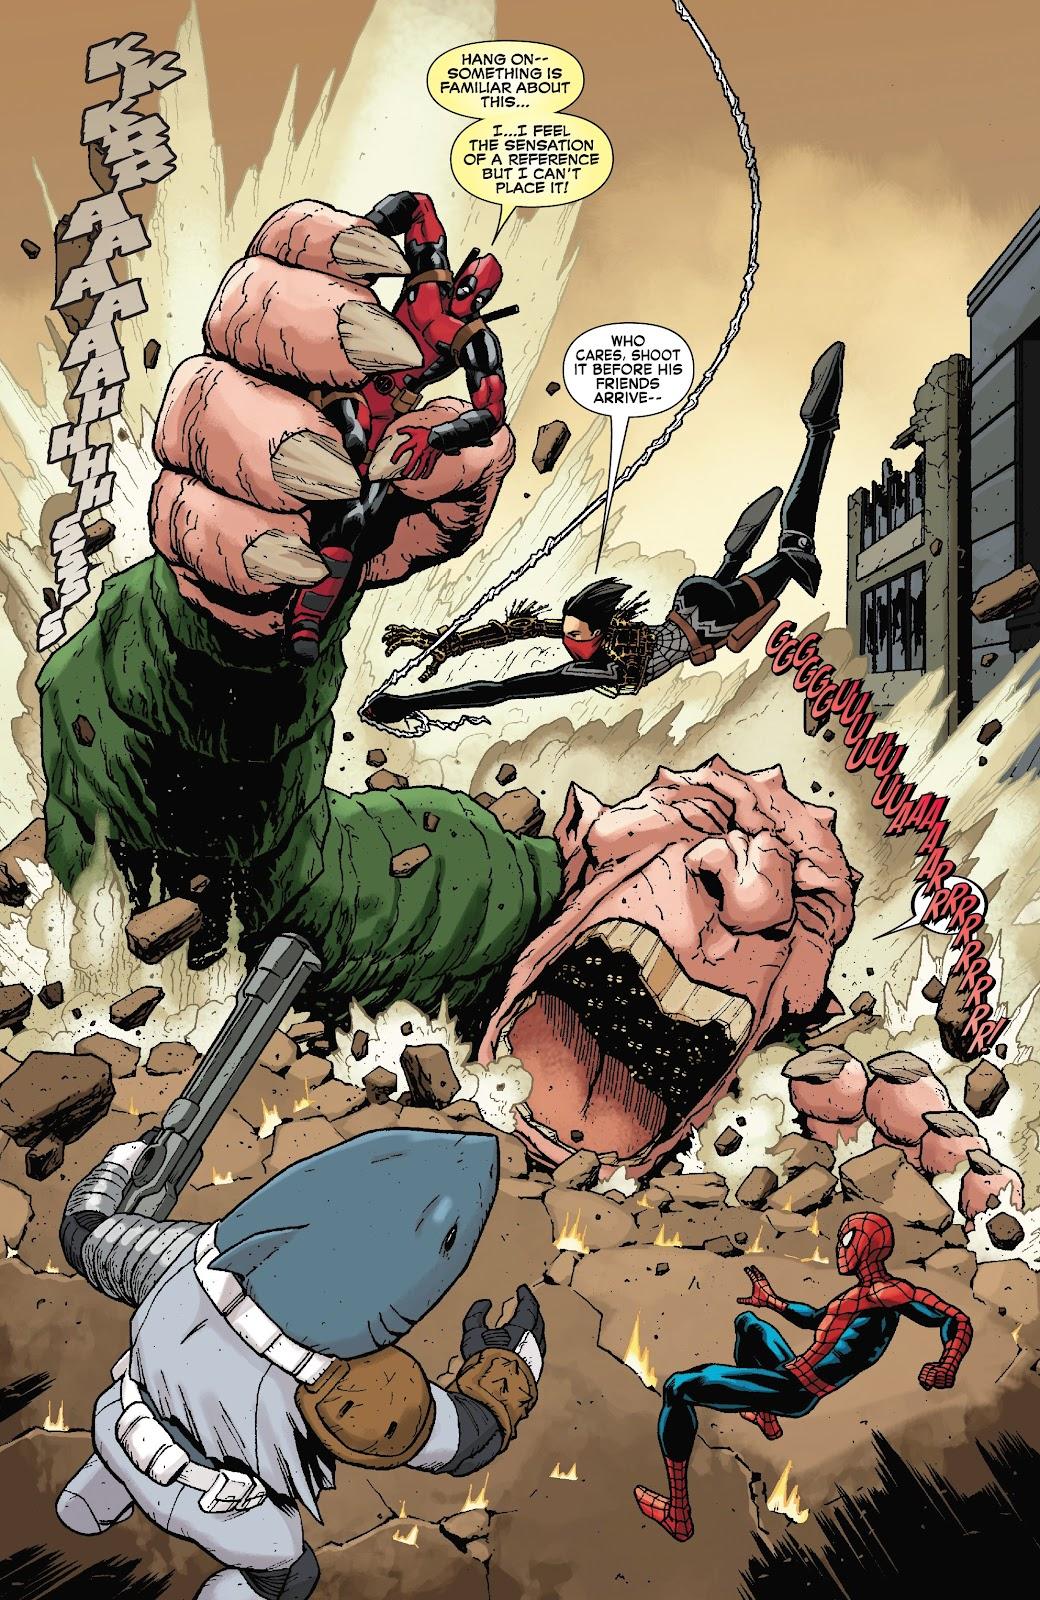 Read online Spider-Man/Deadpool comic -  Issue #46 - 13